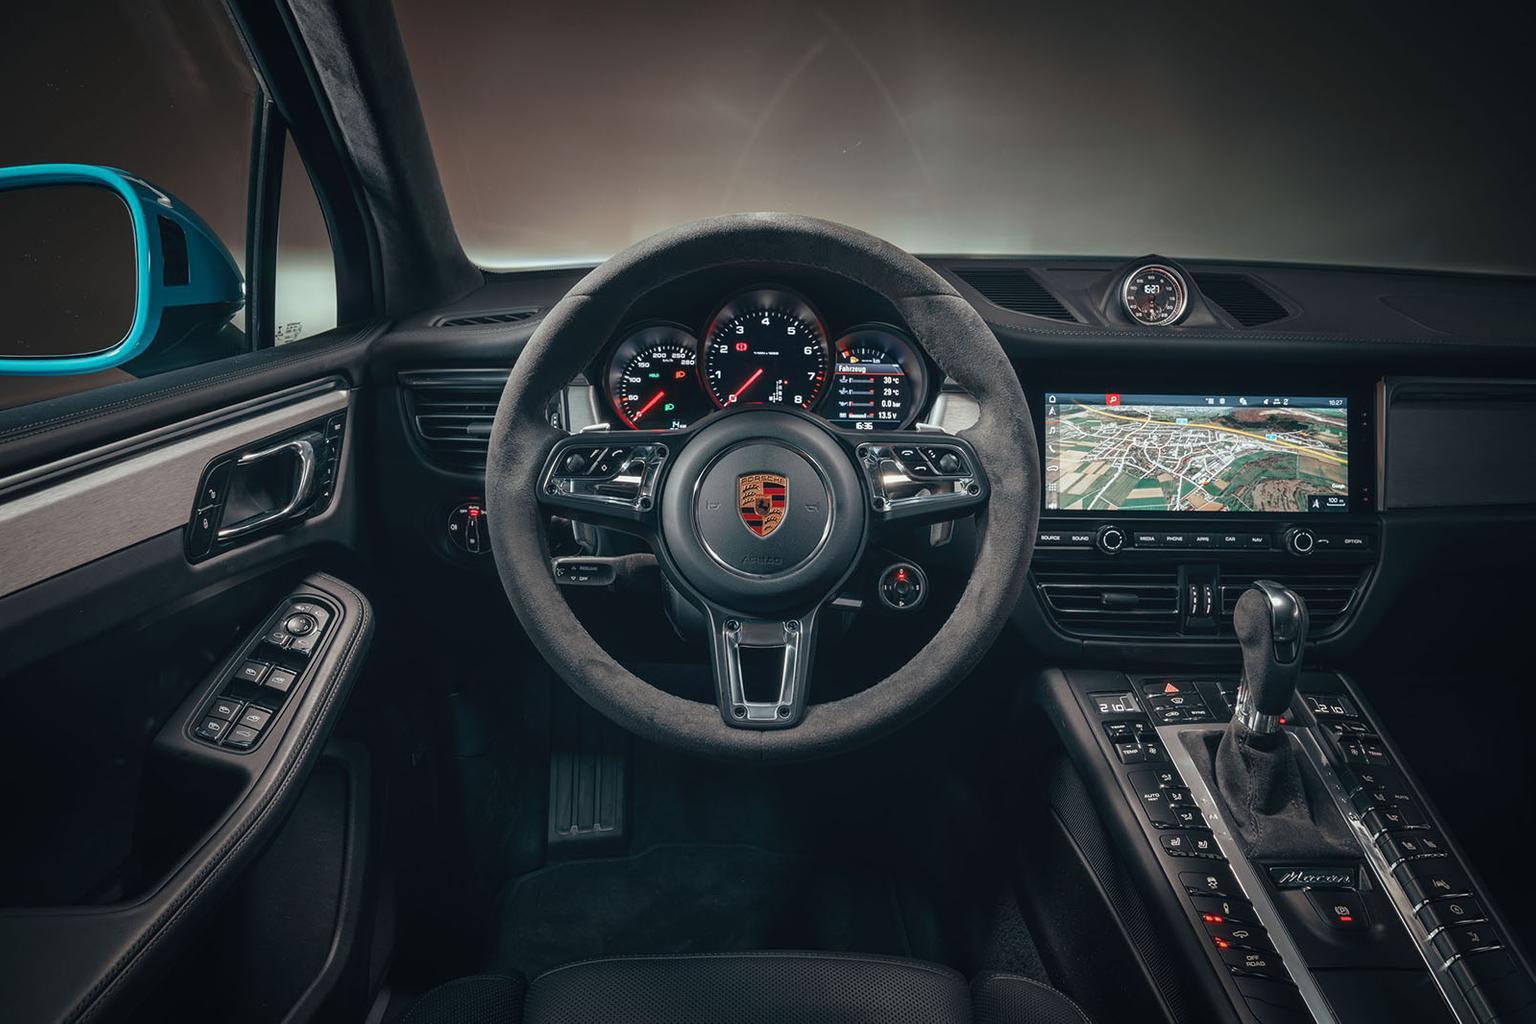 2019 Porsche Macan – price, specs and release date